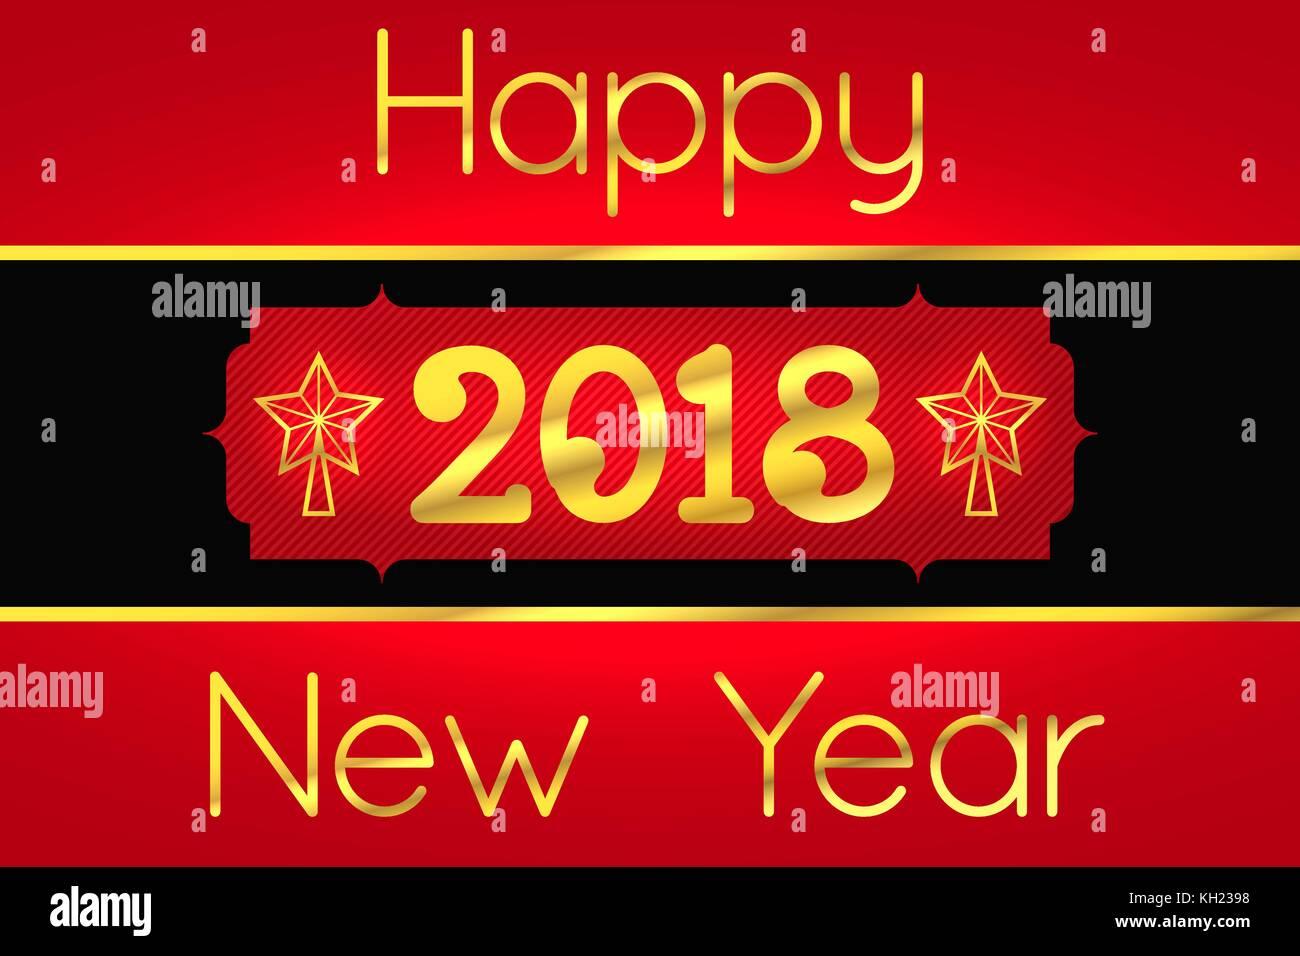 Happy New Year 2018 Vector Stockfotos & Happy New Year 2018 Vector ...